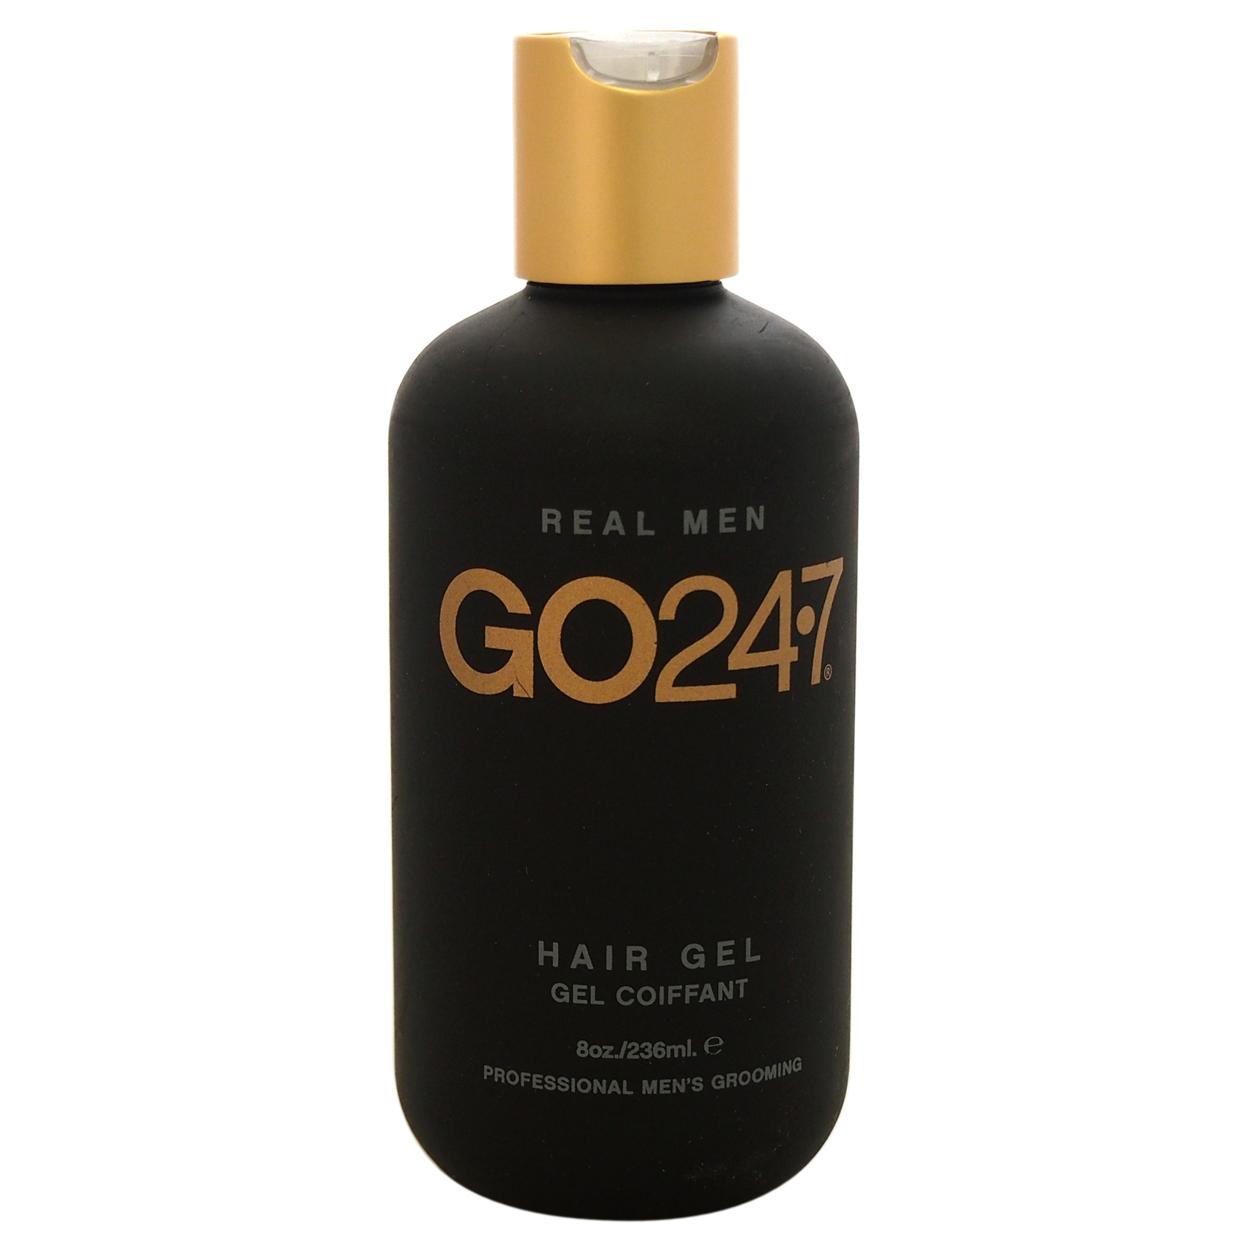 Real Men Hair Gel by Go247 for Men - 8 oz Gel 5898e1b0c98fc450900ecb96